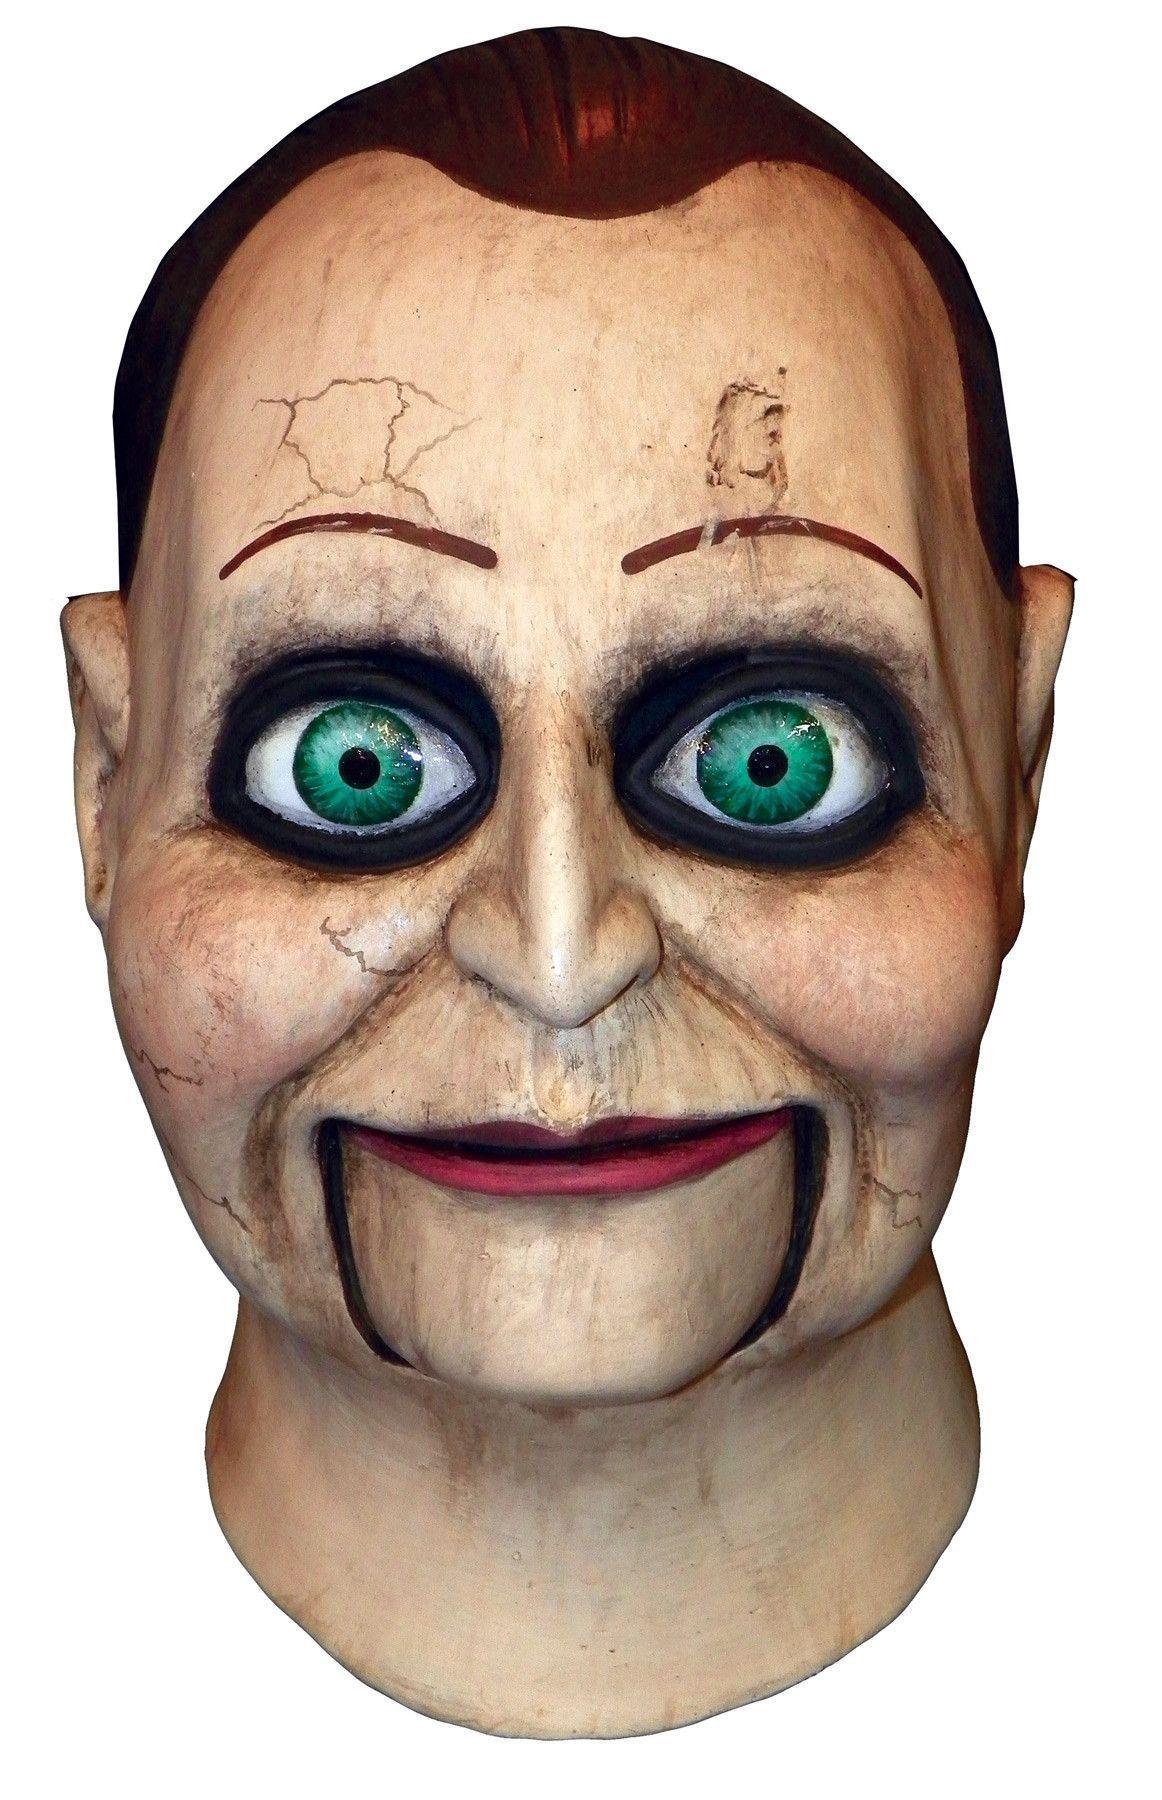 Frankenstein deluxe collectors horror mask | Masks | Pinterest ...